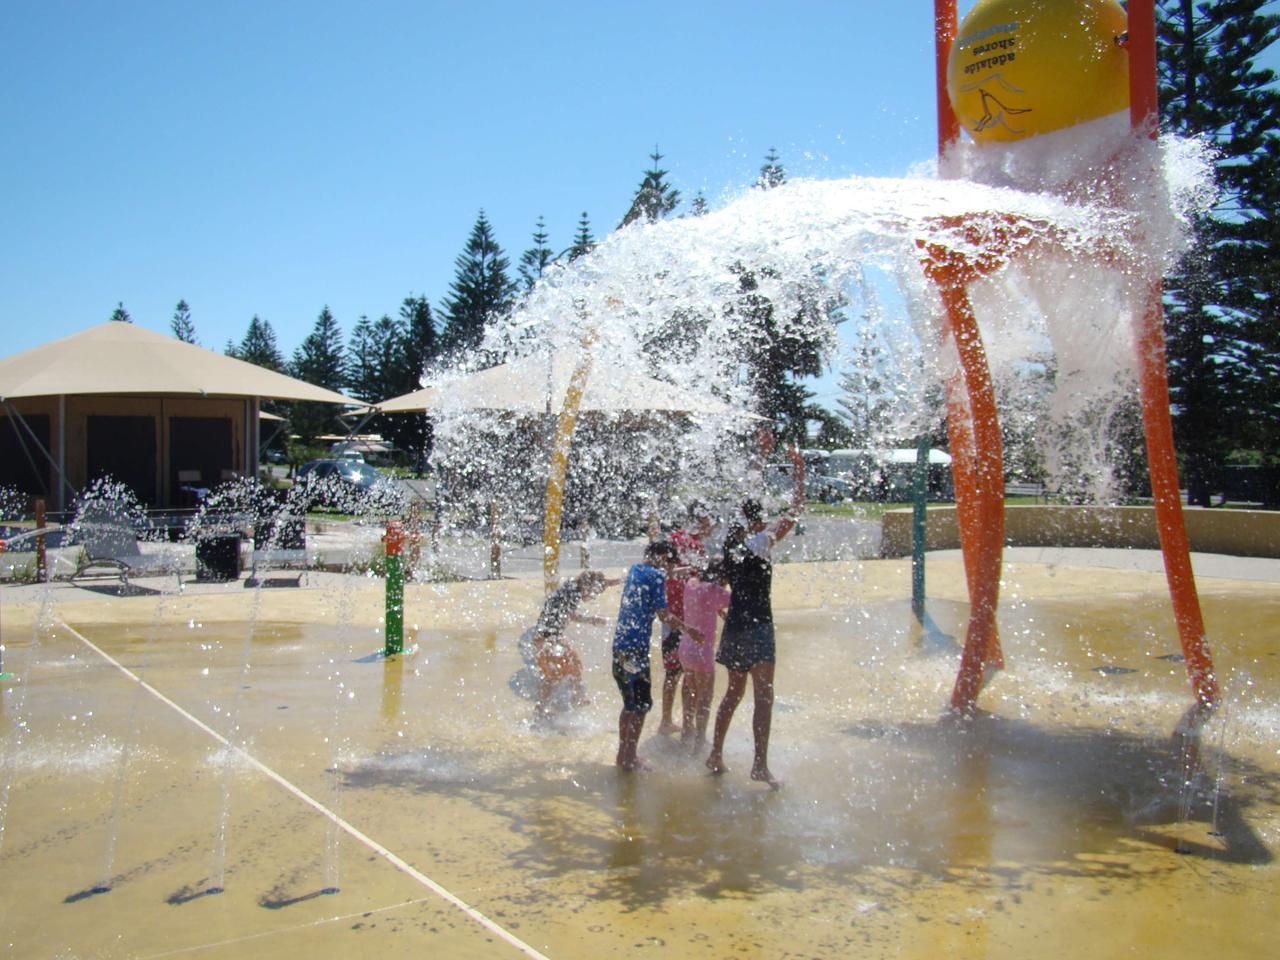 The Big4 West Beach holiday park.